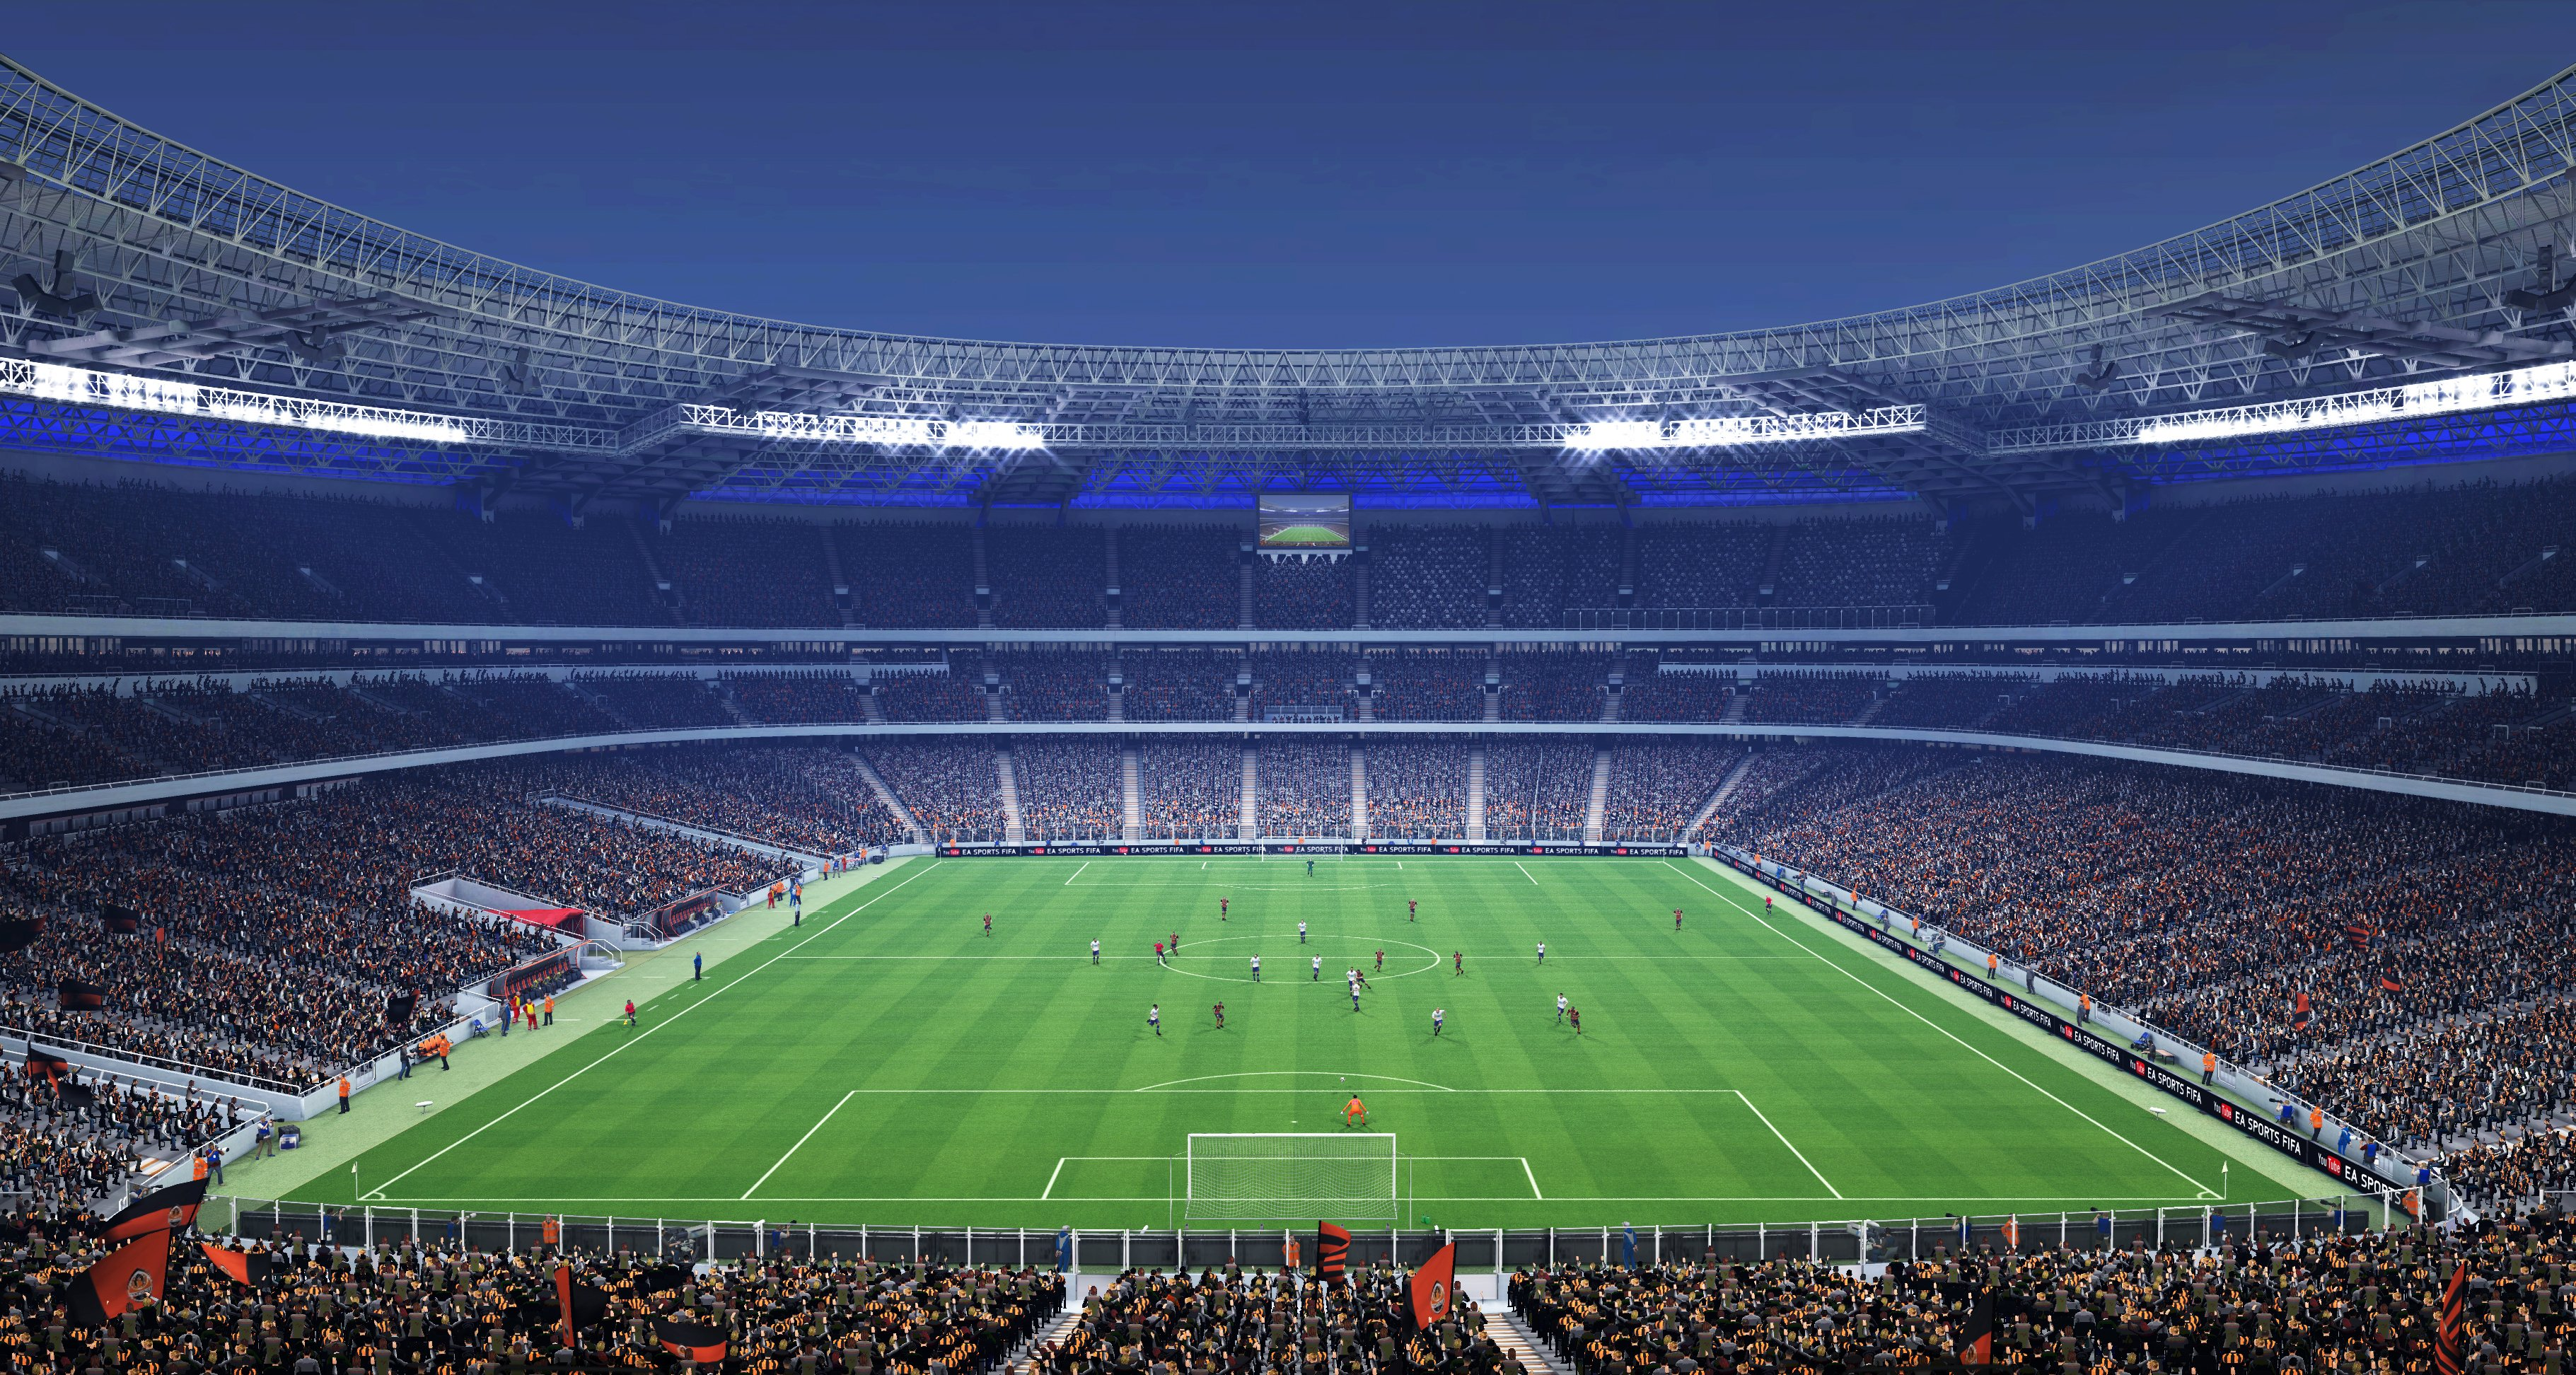 Fifa wallpaper impremedia fifa 14 world cup soccer game fifa14 2 wallpaper 3642x1944 362058 voltagebd Image collections